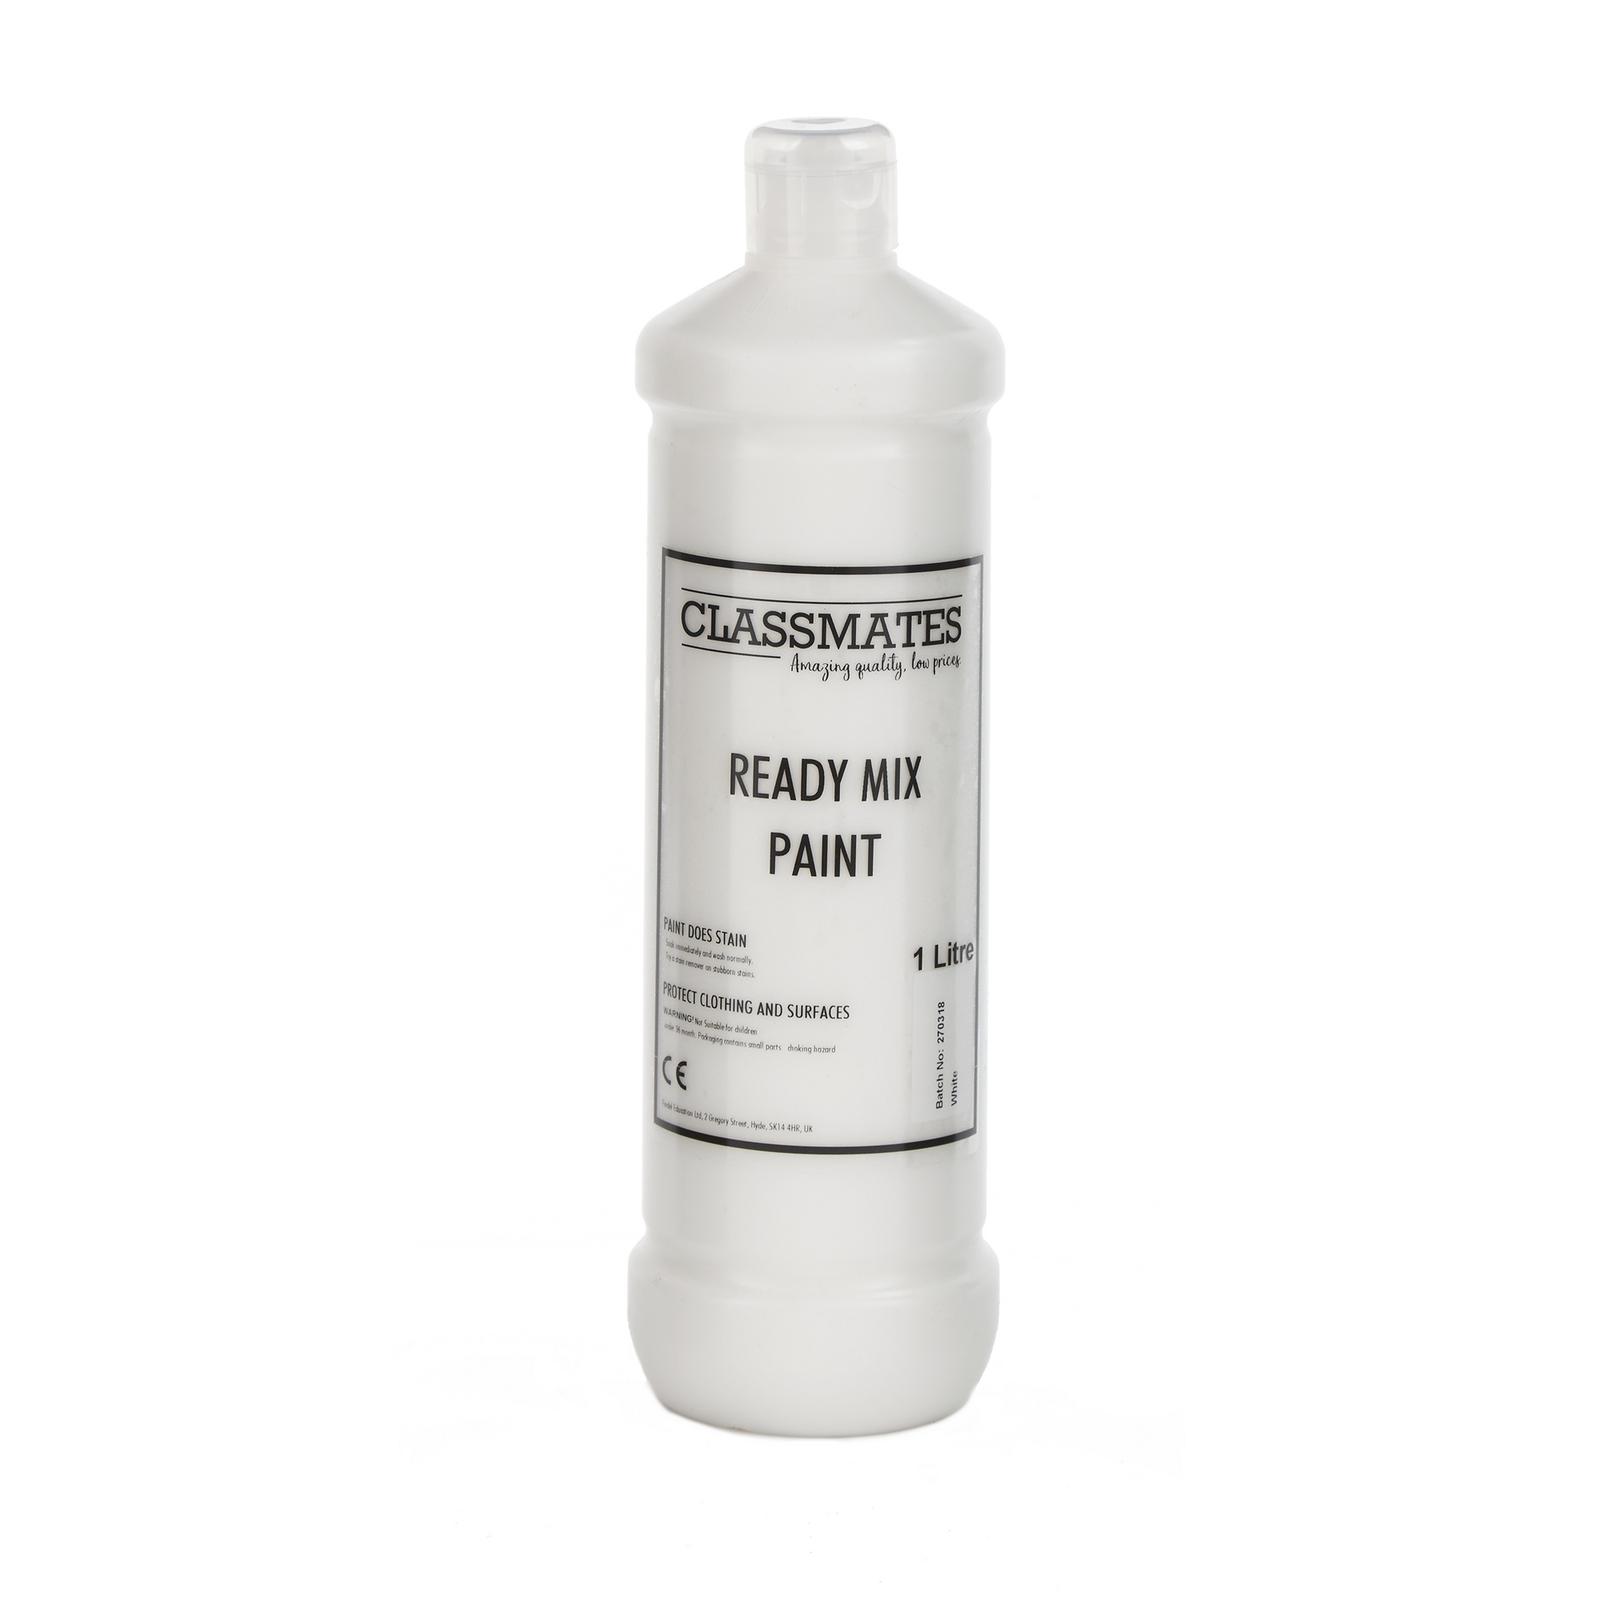 Classmates Ready Mixed Paint in White - 1 Litre Bottle